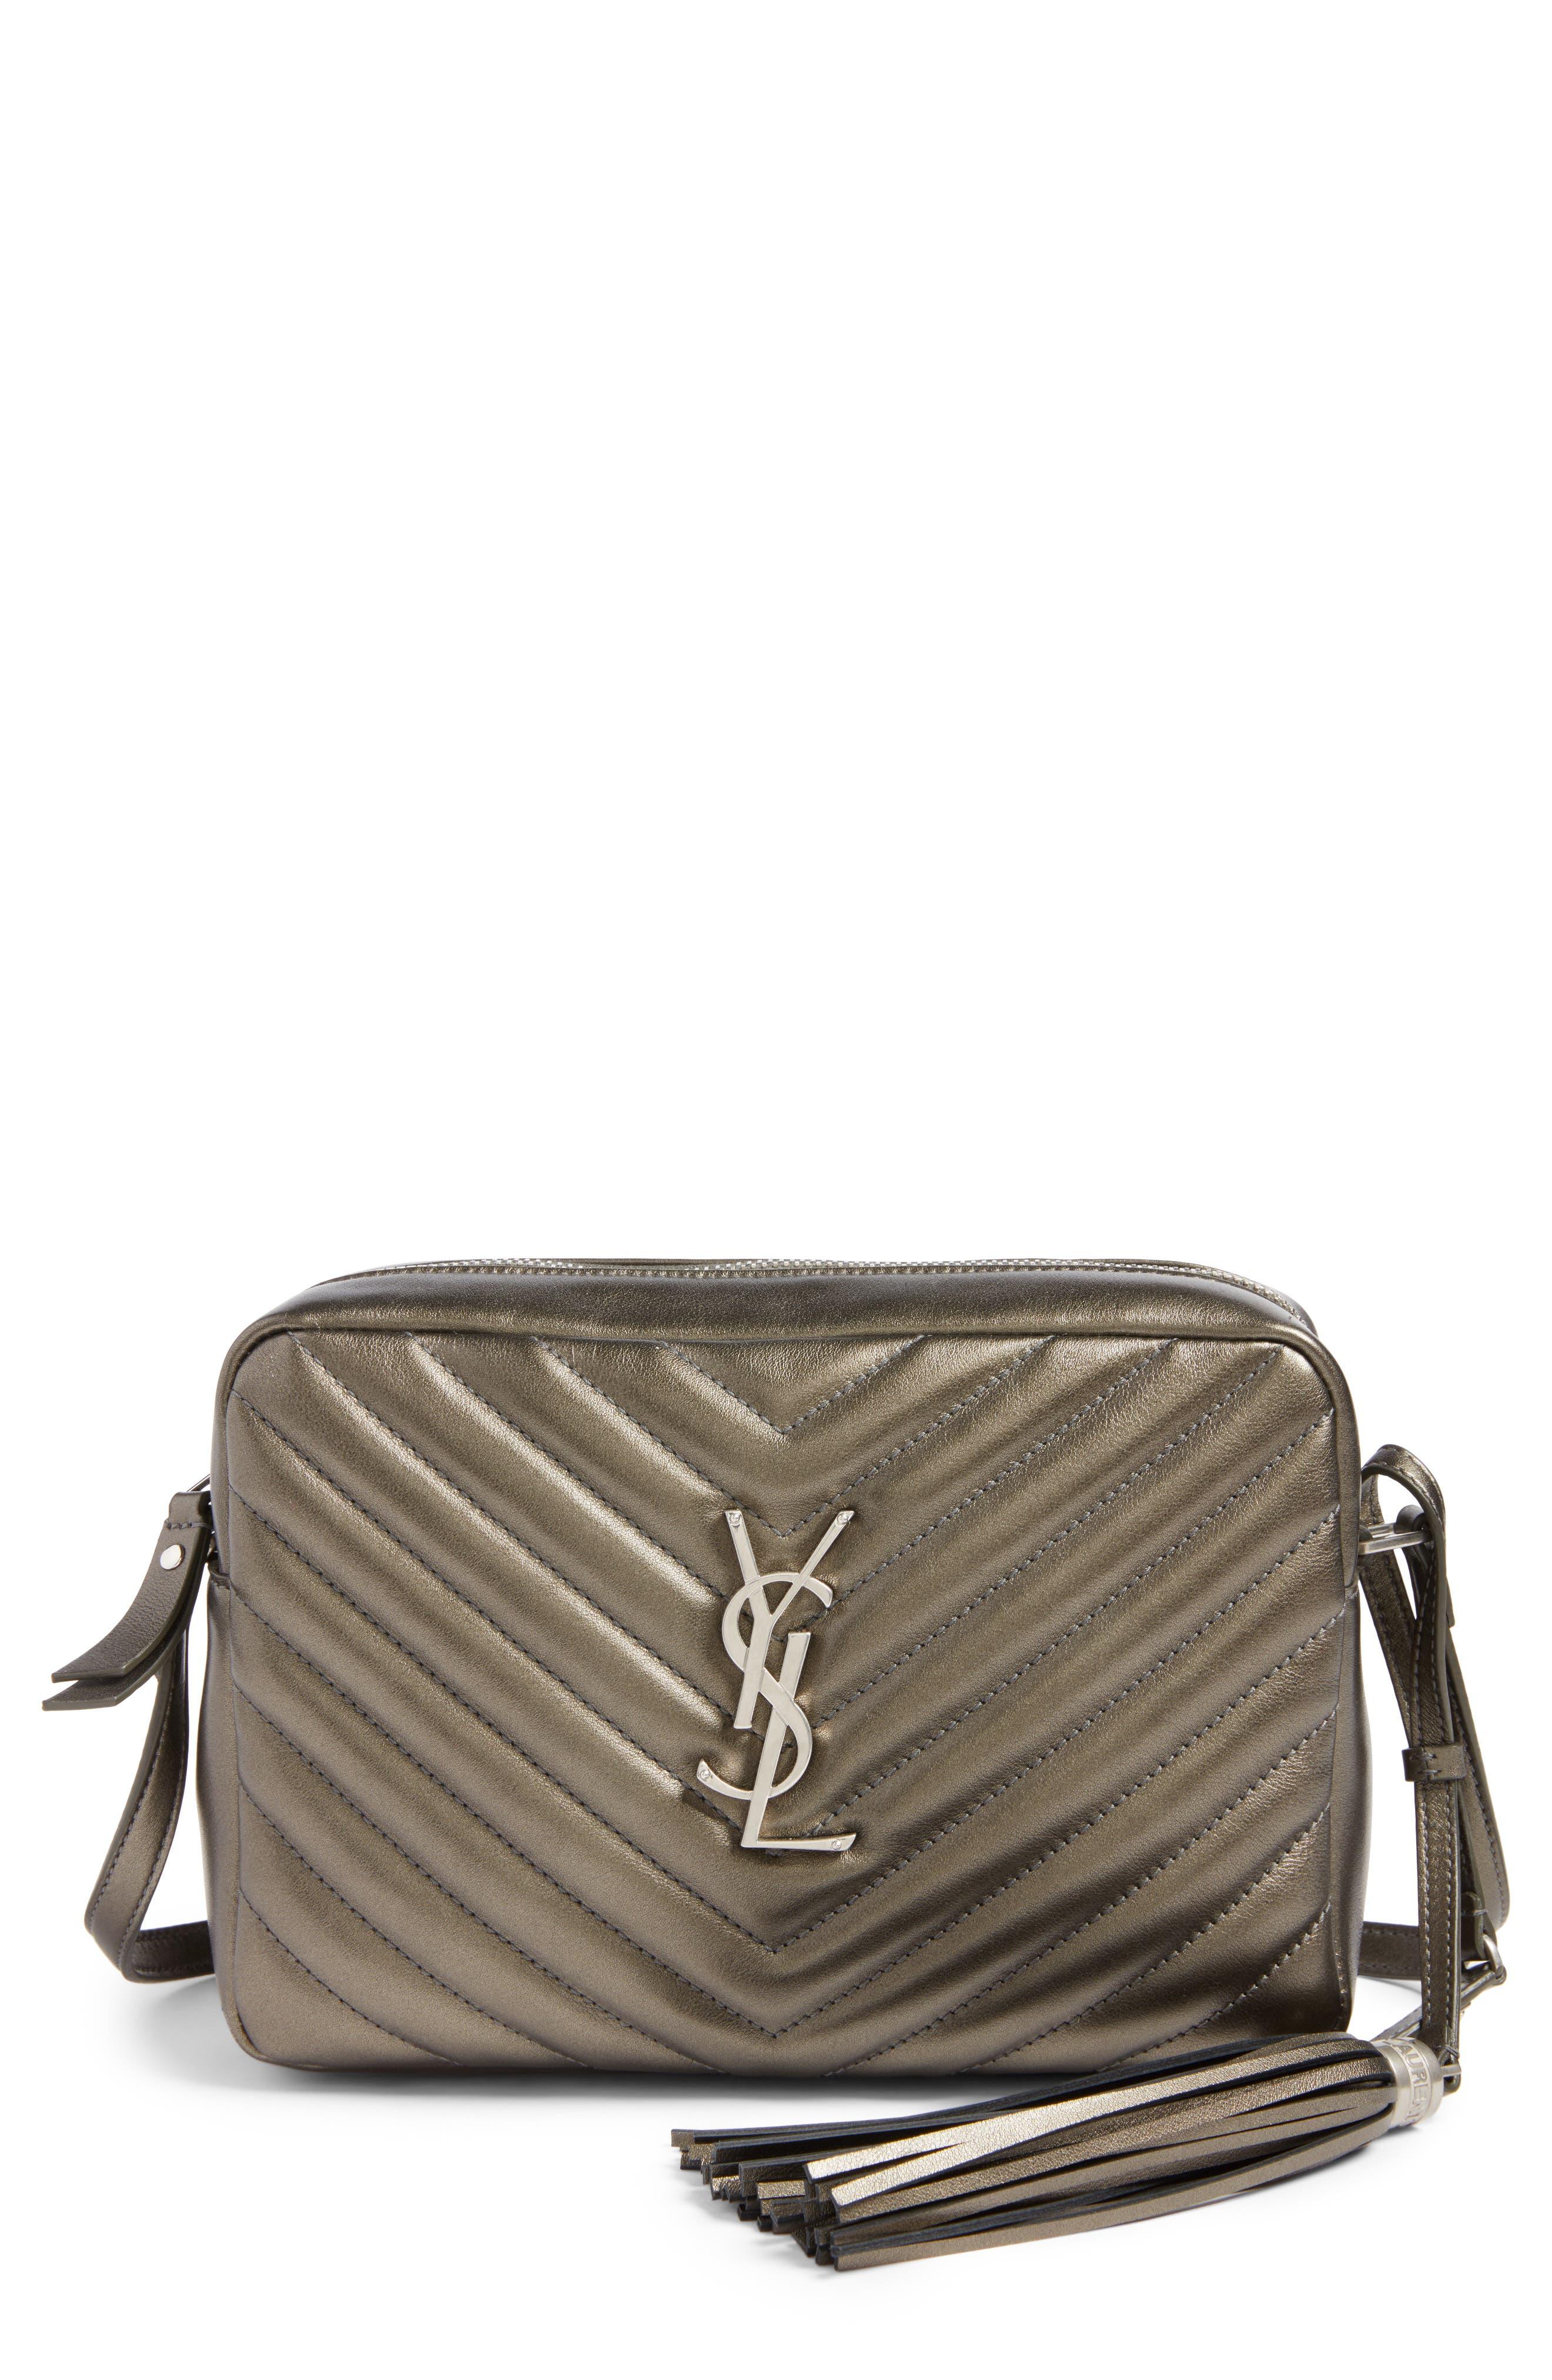 Medium Lou Calfskin Leather Camera Bag, Main, color, 020